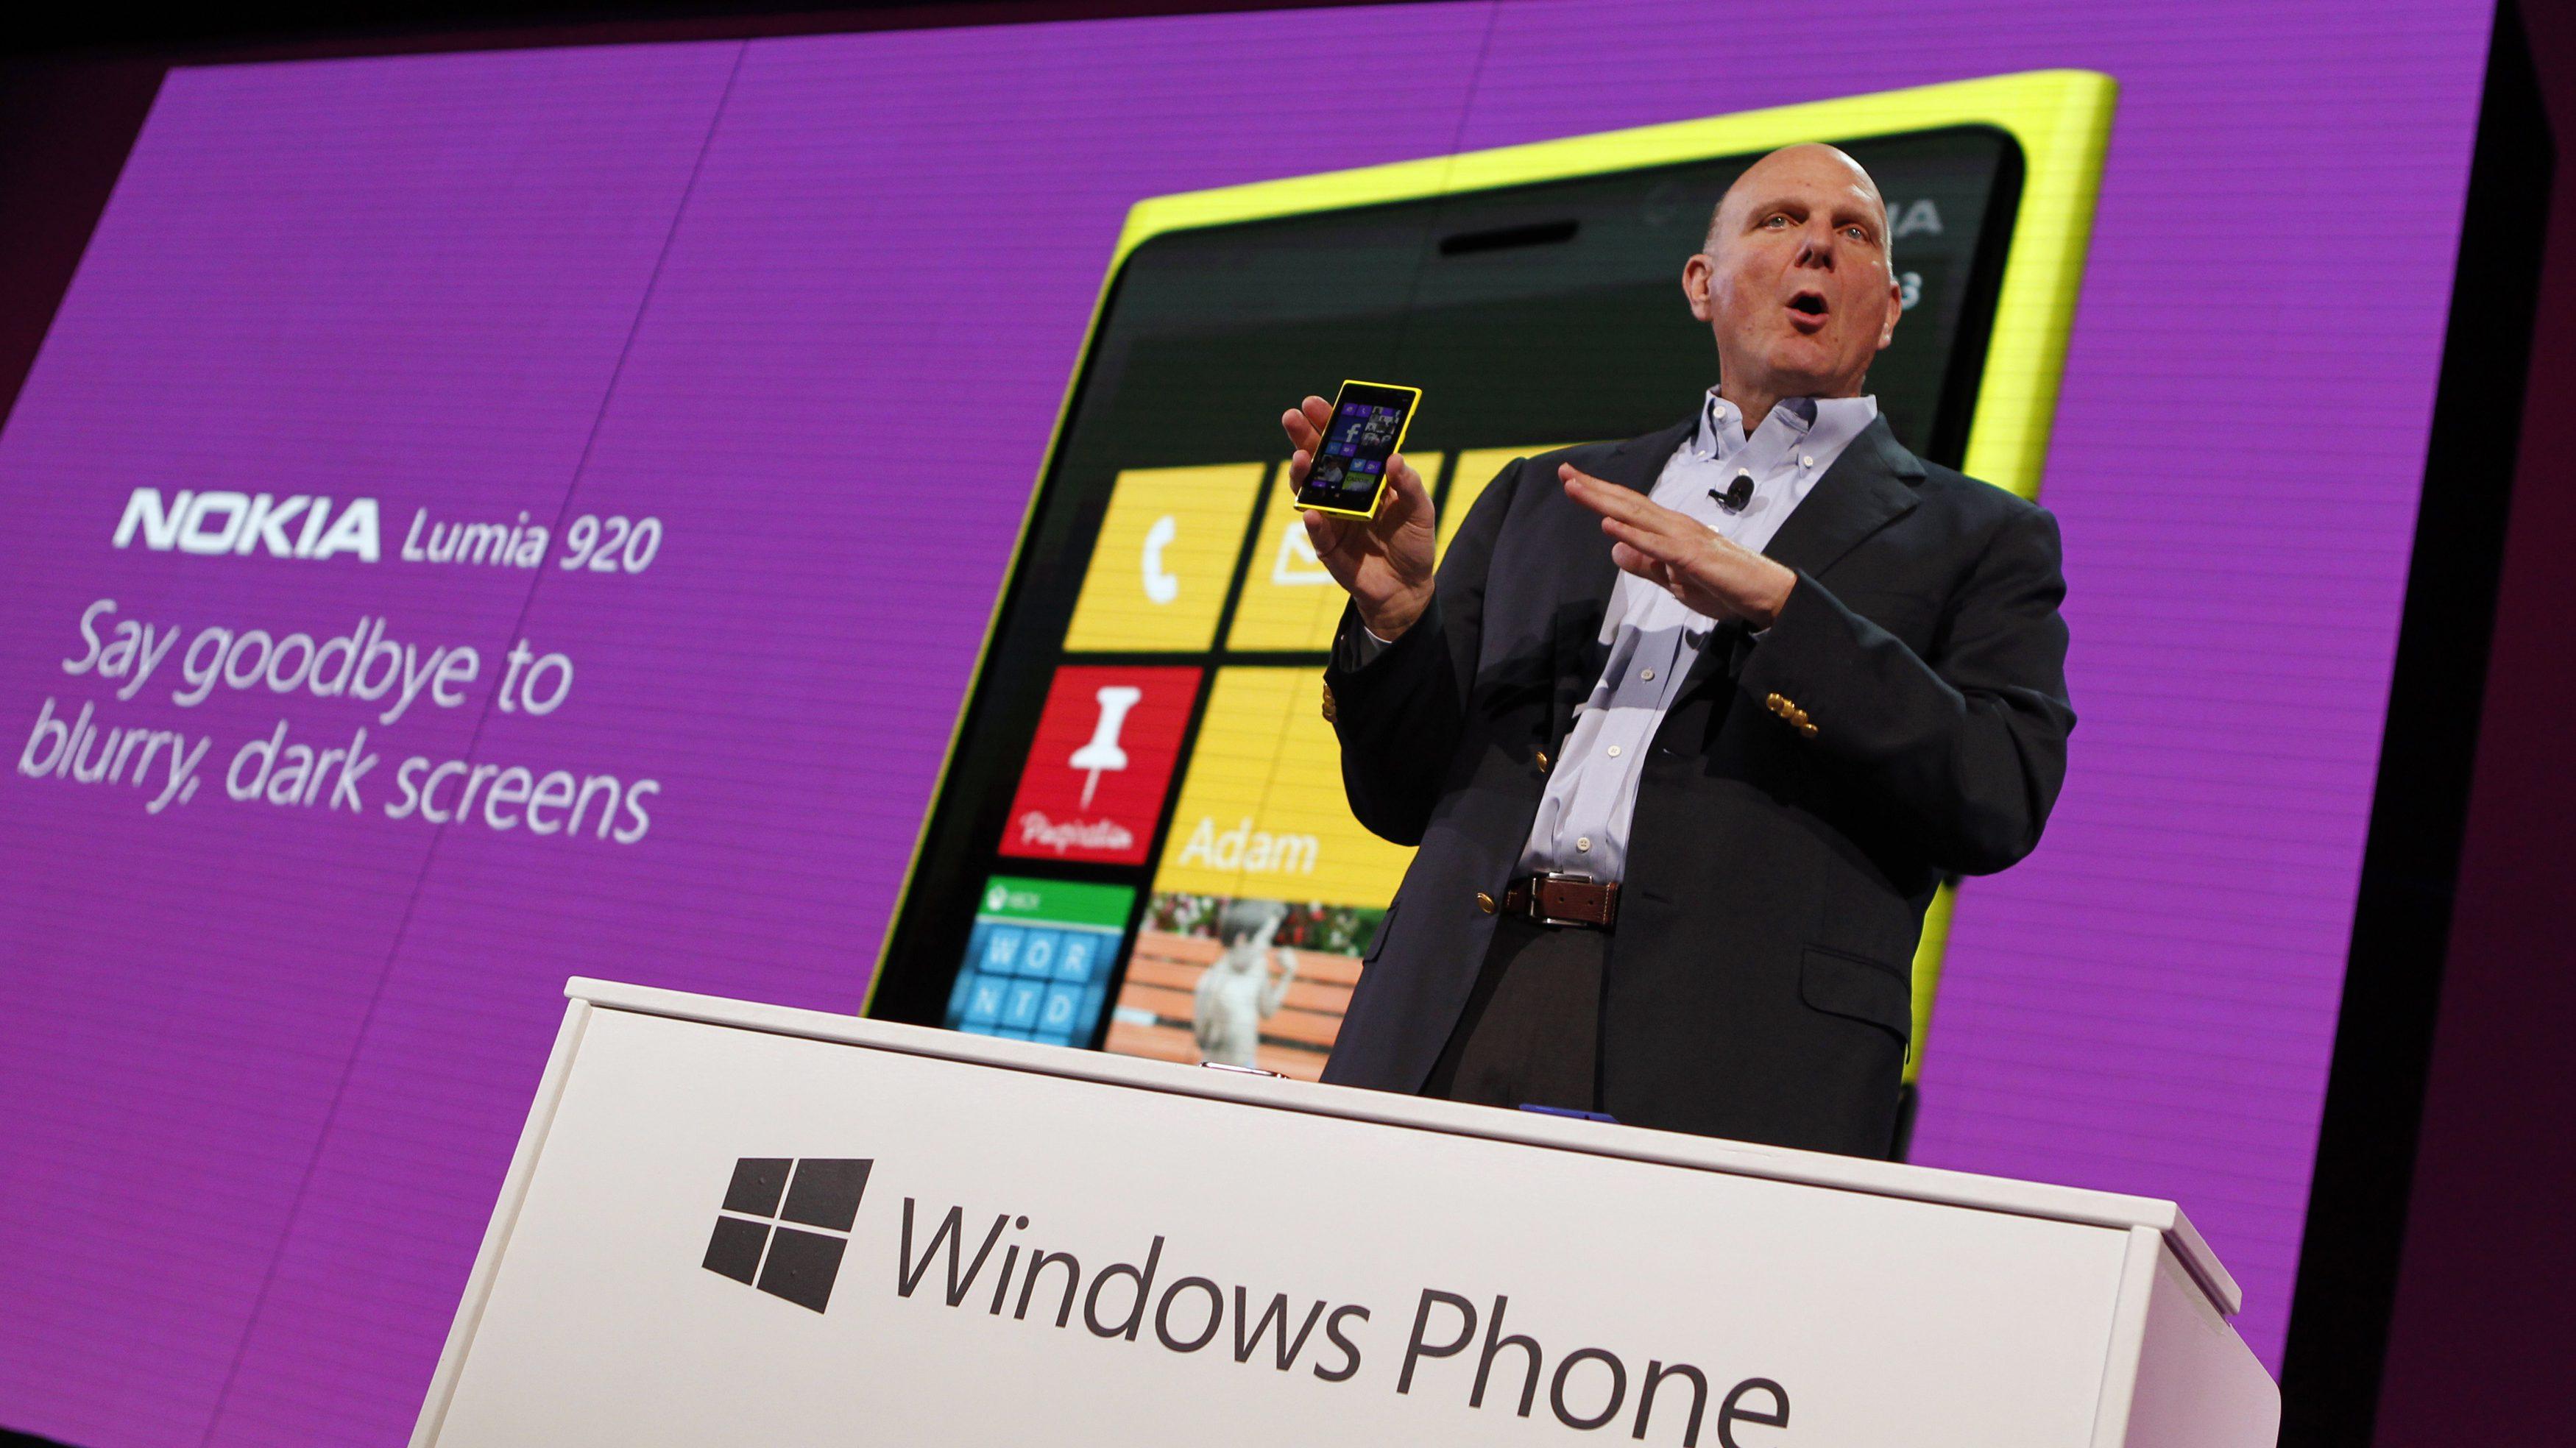 Microsoft Corp CEO Steve Ballmer displays a Nokia Lumia 920 featuring Windows Phone 8 during an event in San Francisco, California October 29, 2012.